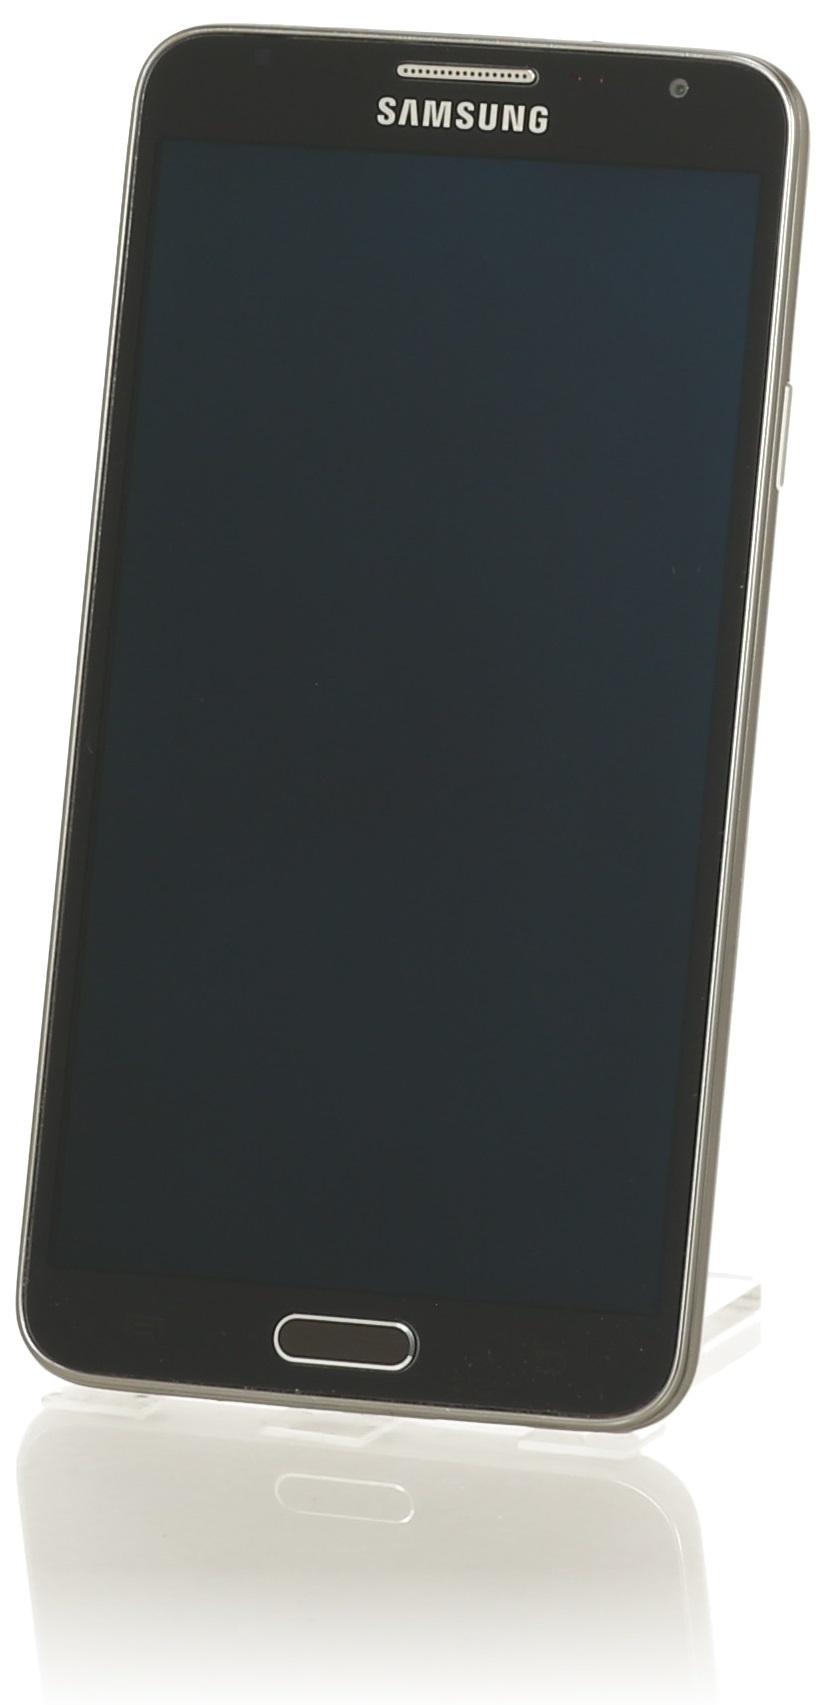 Samsung N7505 Galaxy Note III Neo 16GB black